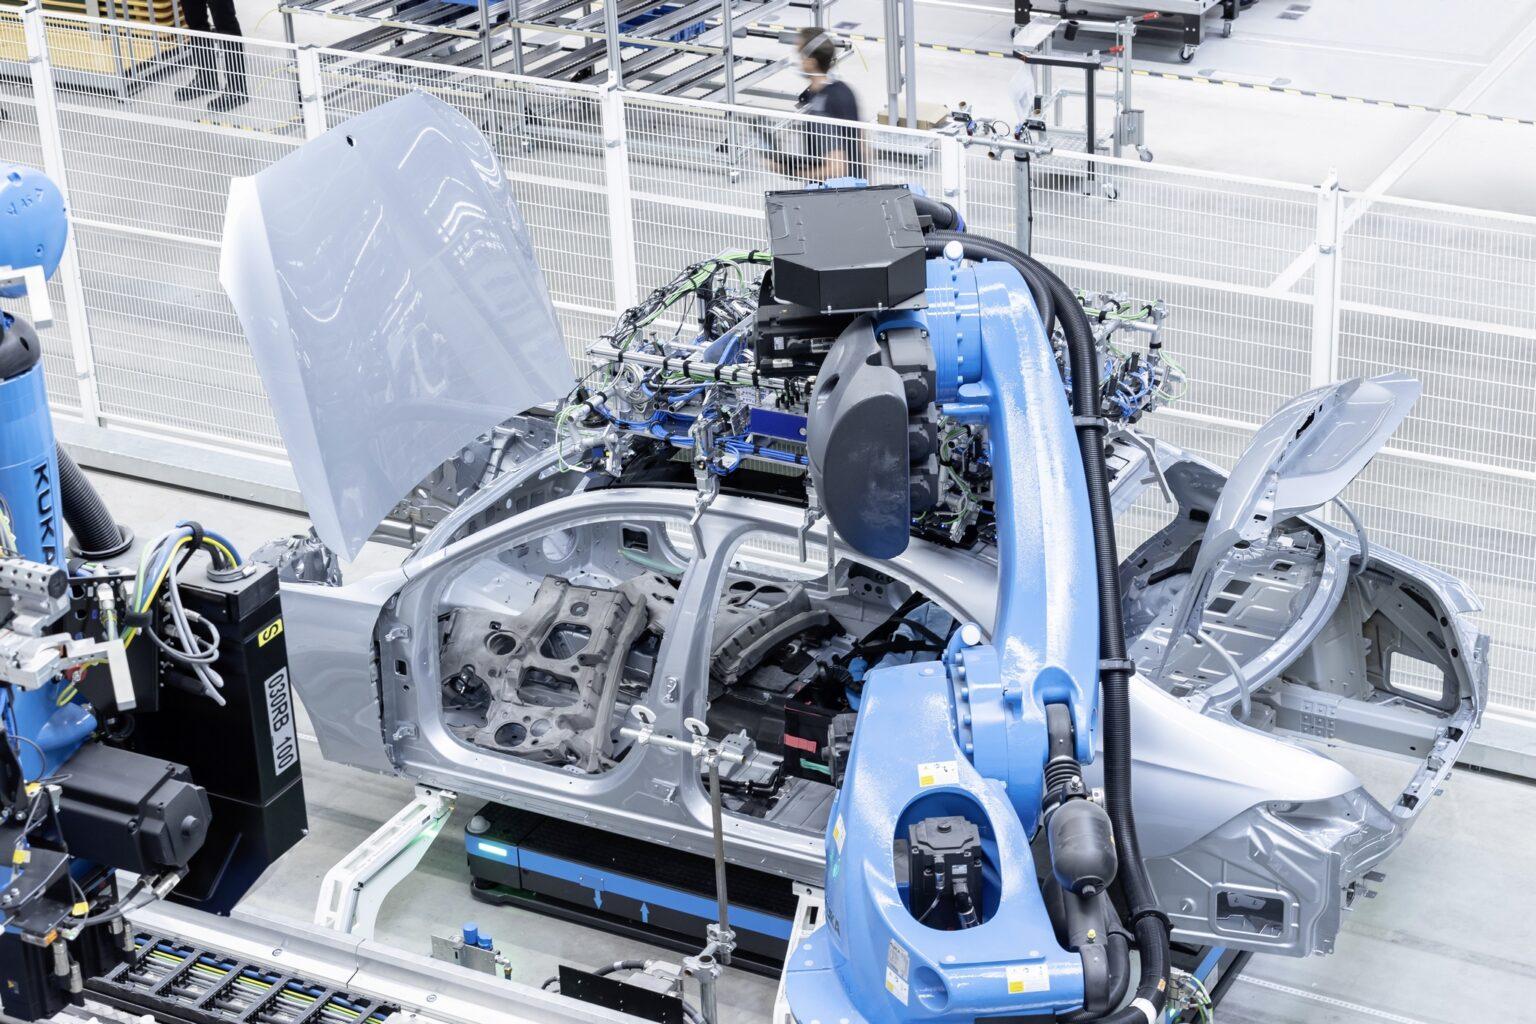 Mercedes-Benz beendet größtenteils Produktionsstopp